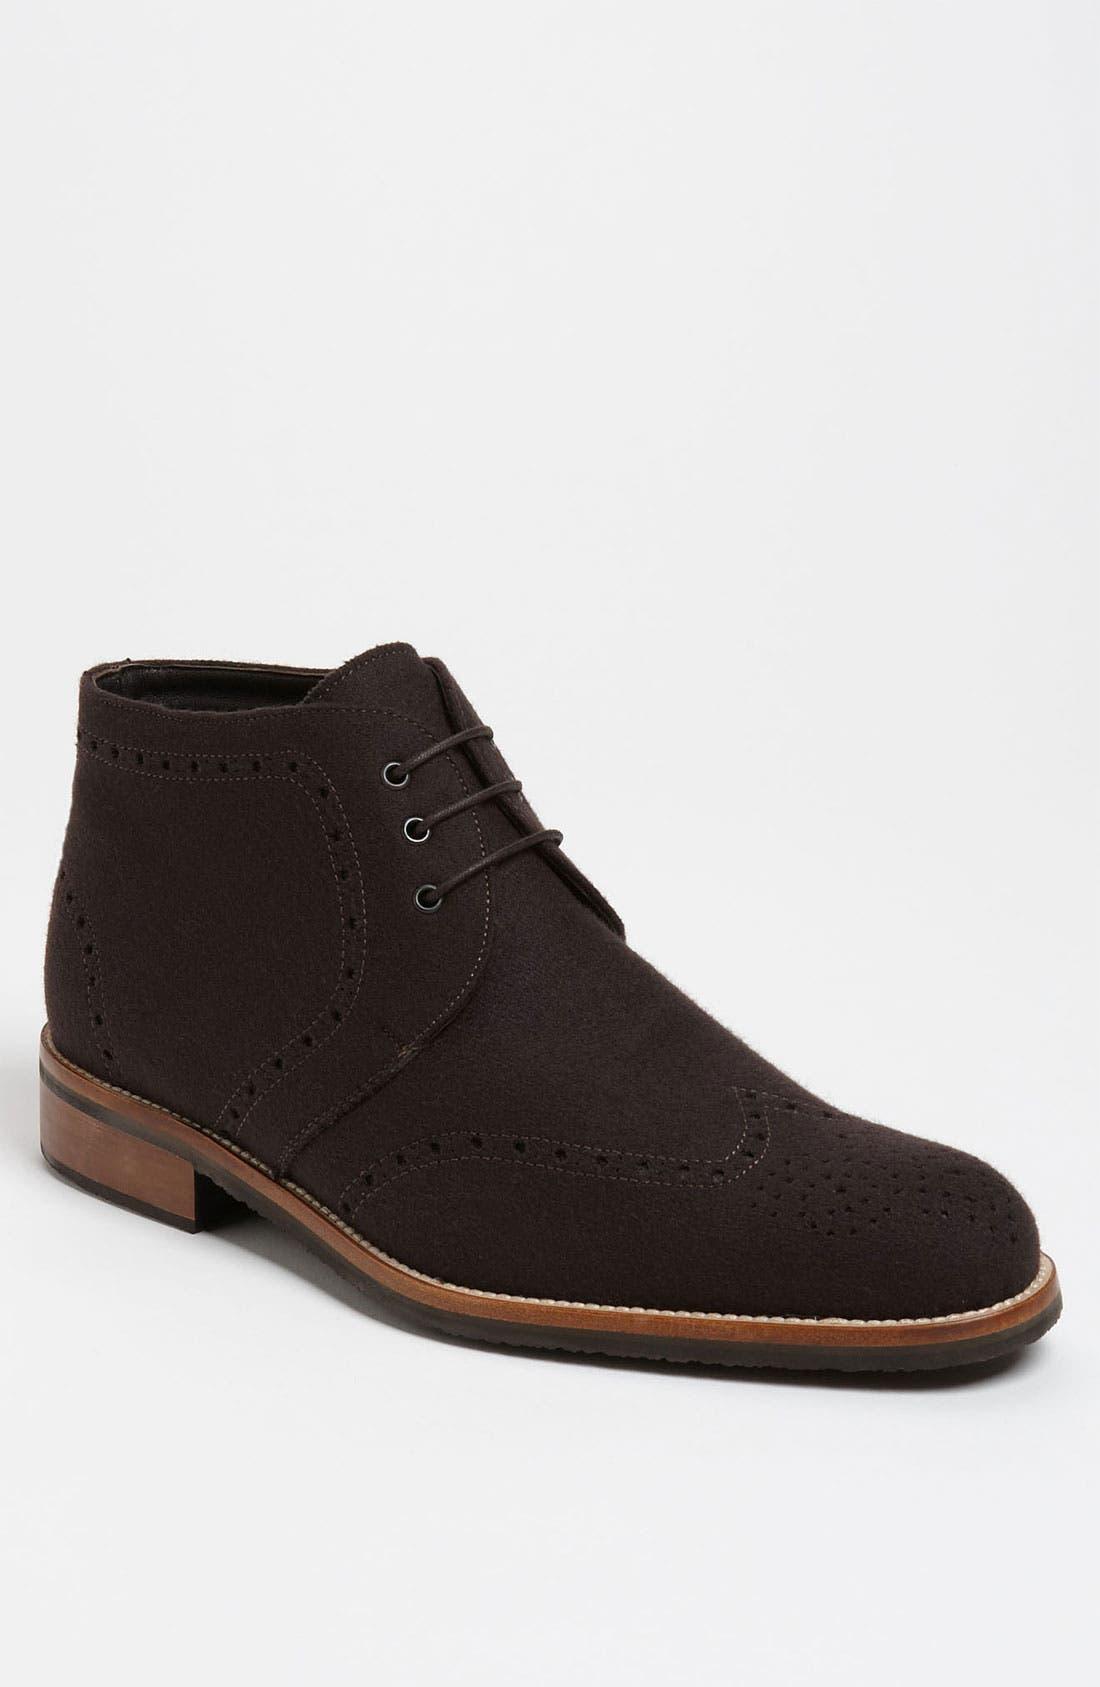 Alternate Image 1 Selected - Thomas Dean Wool Wingtip Chukka Boot